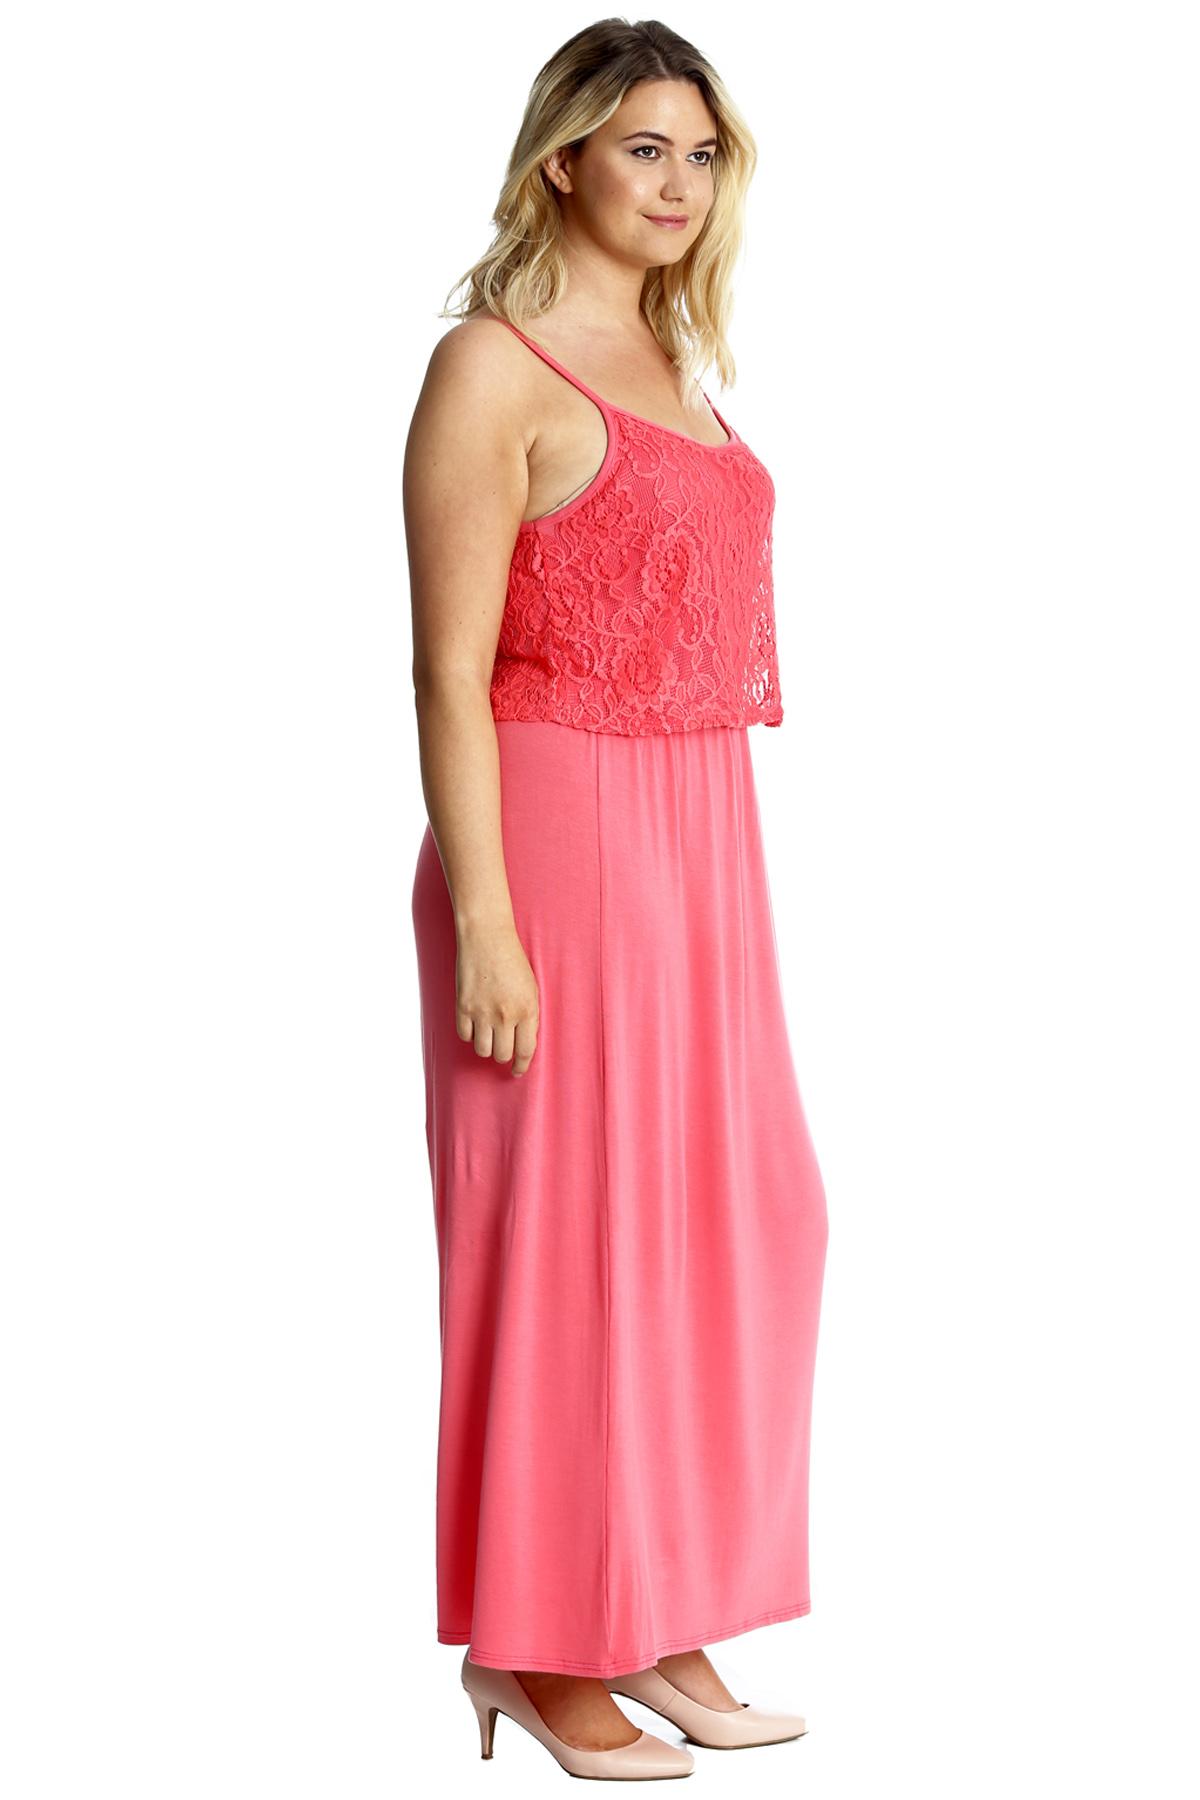 New Womens Maxi Dress Plus Size La S Floral Lace Full